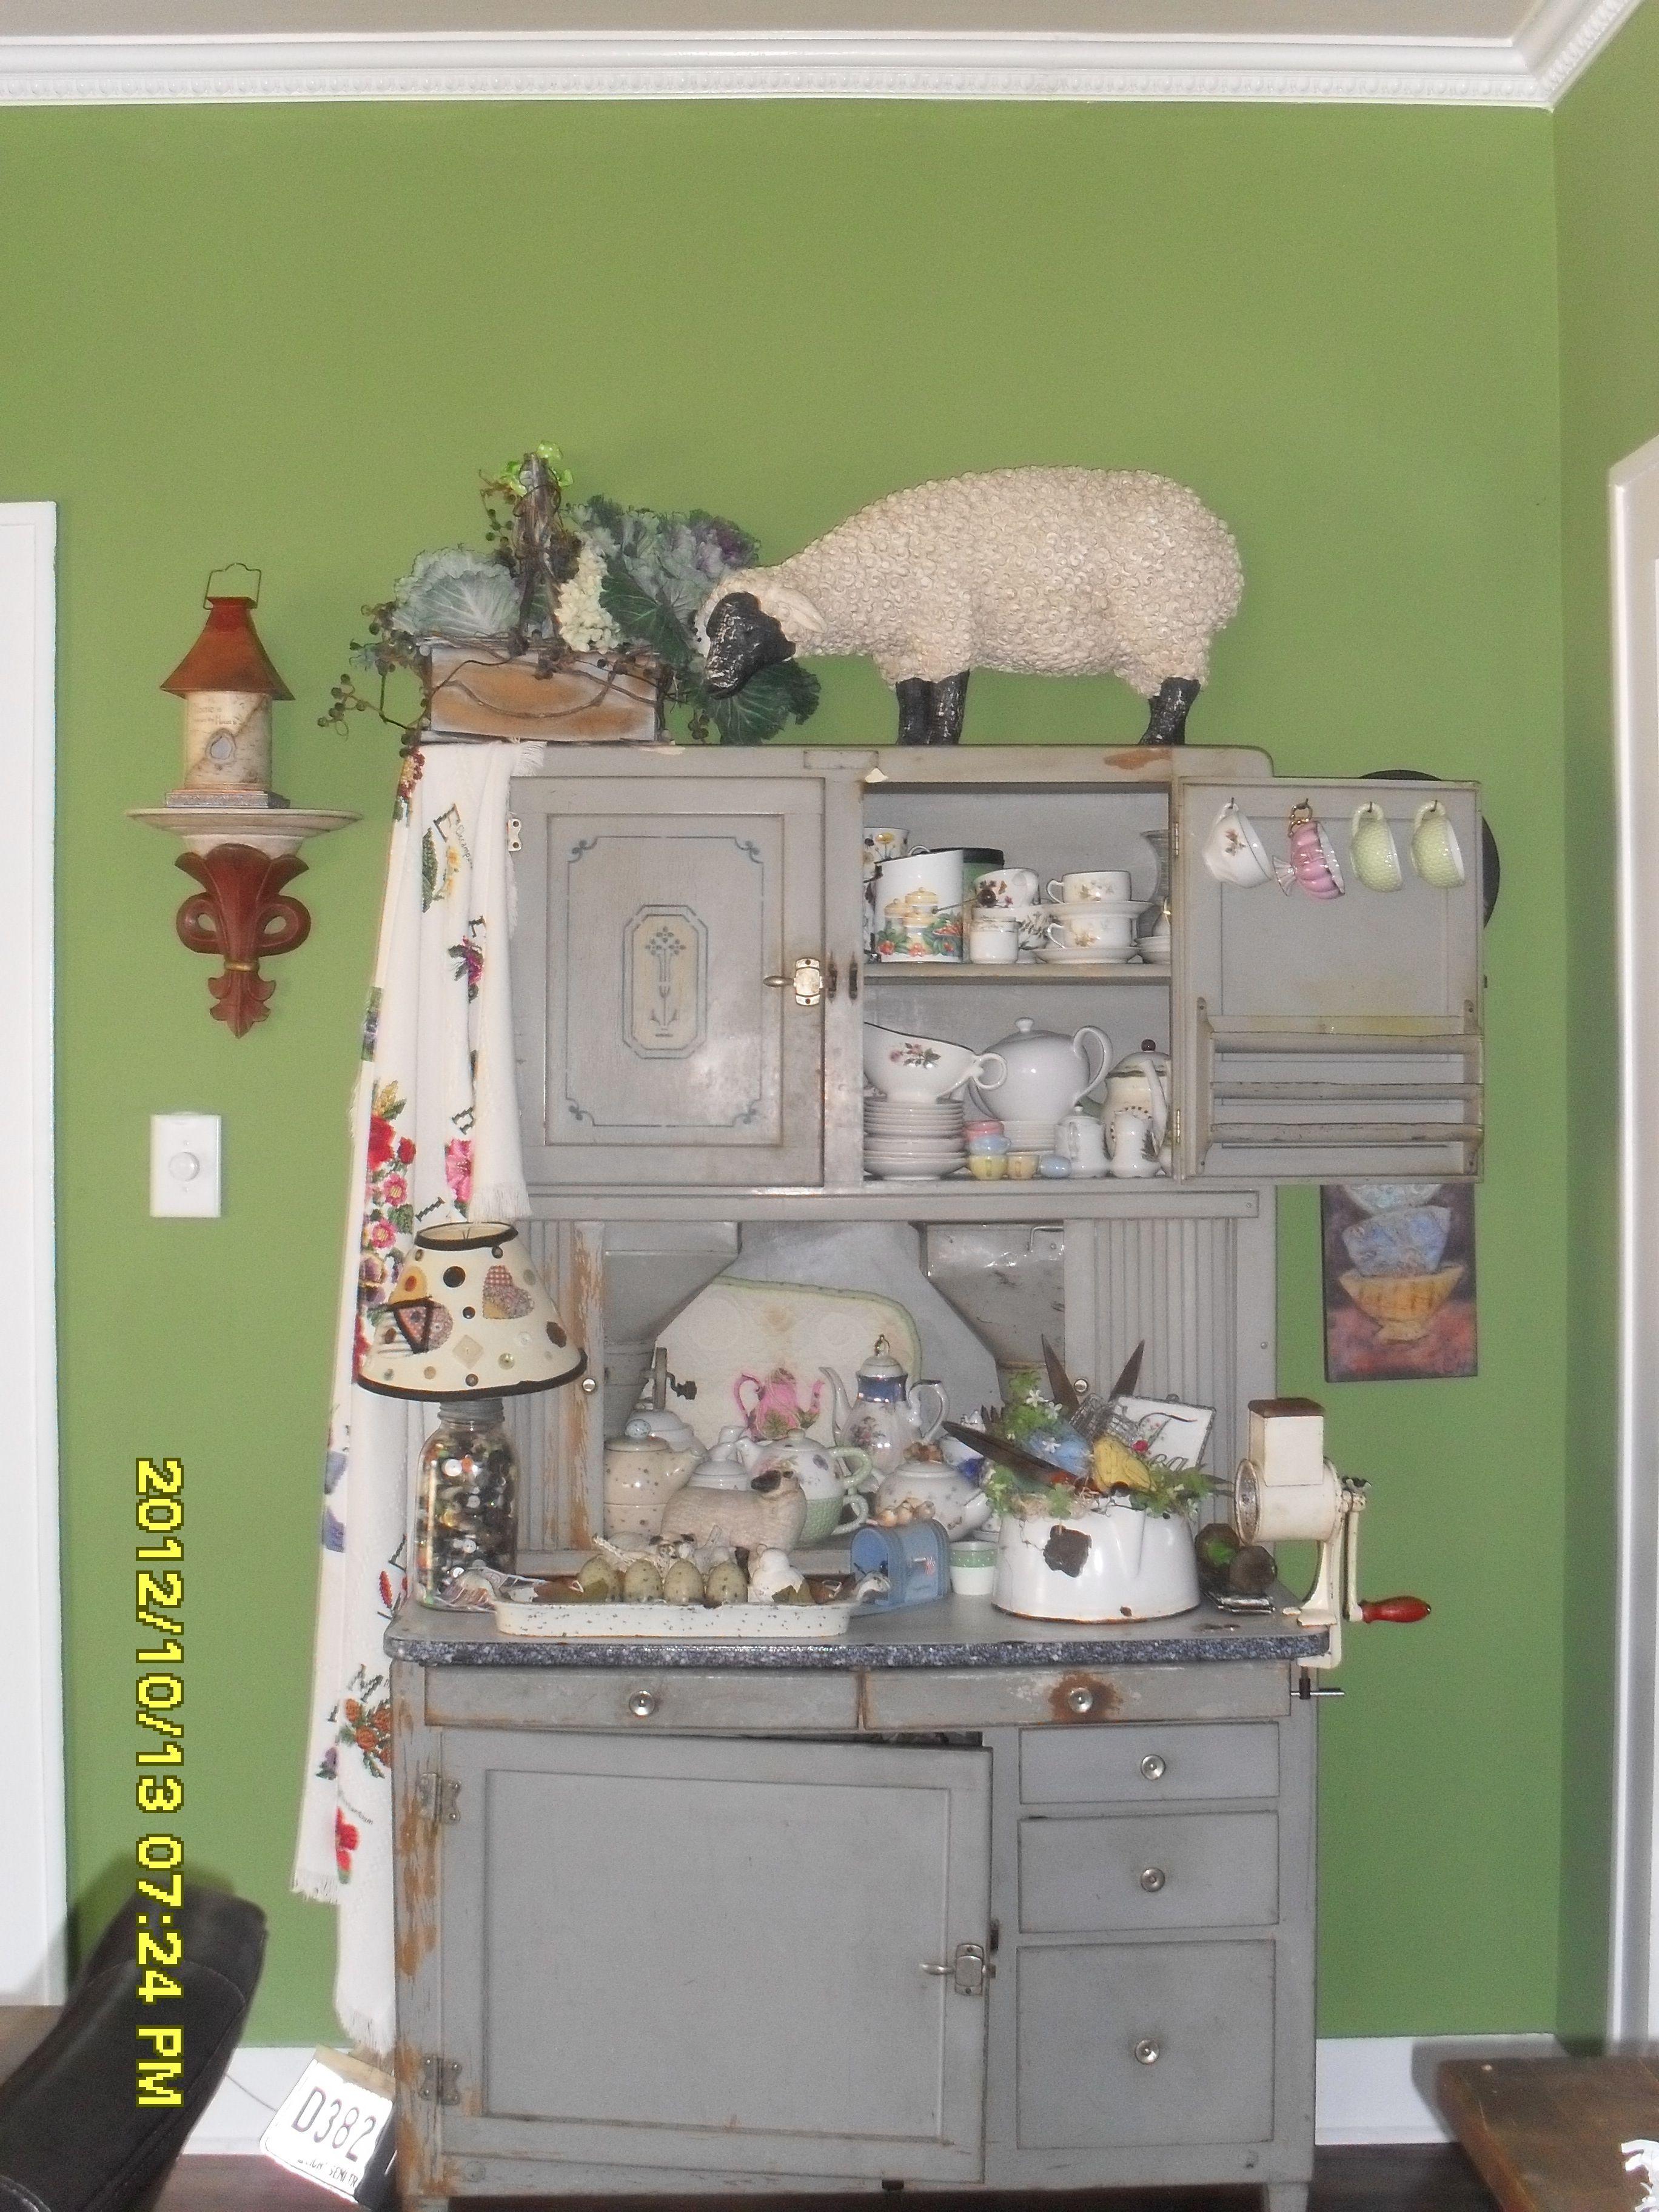 hoosier kitchen cupboard original paint and stencils if you look